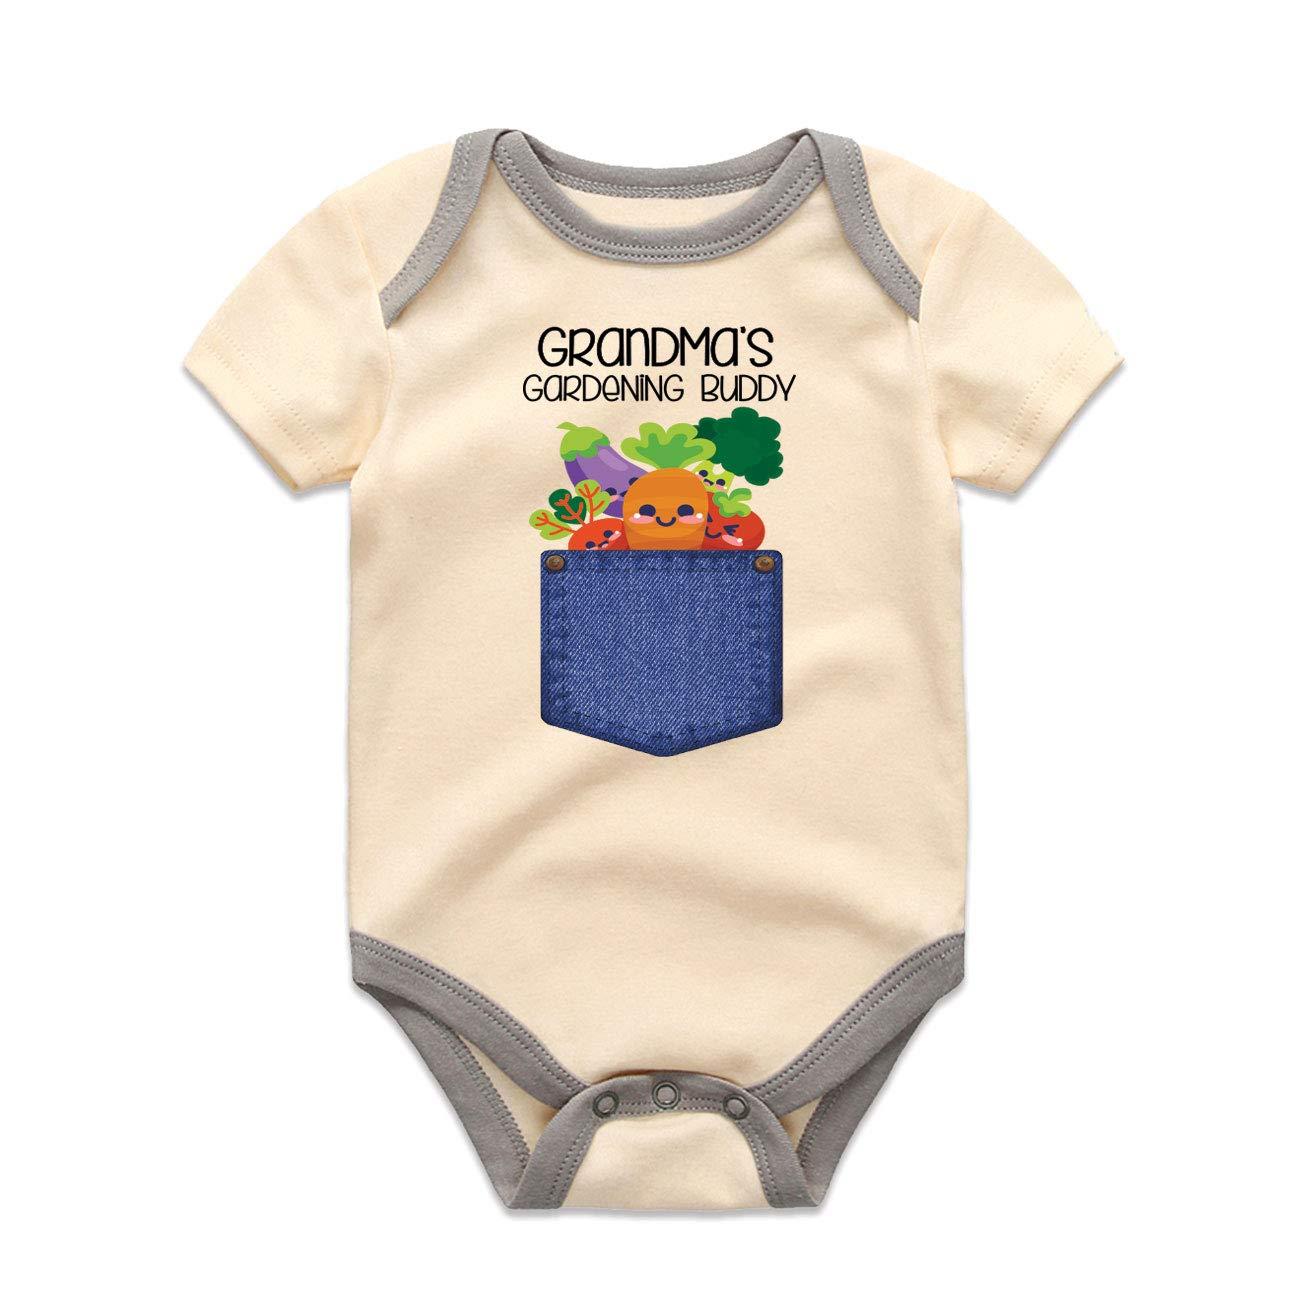 Grandma's Gardening Buddy Onesie® Grandma Max 70% OFF and Romper Fruits Trust